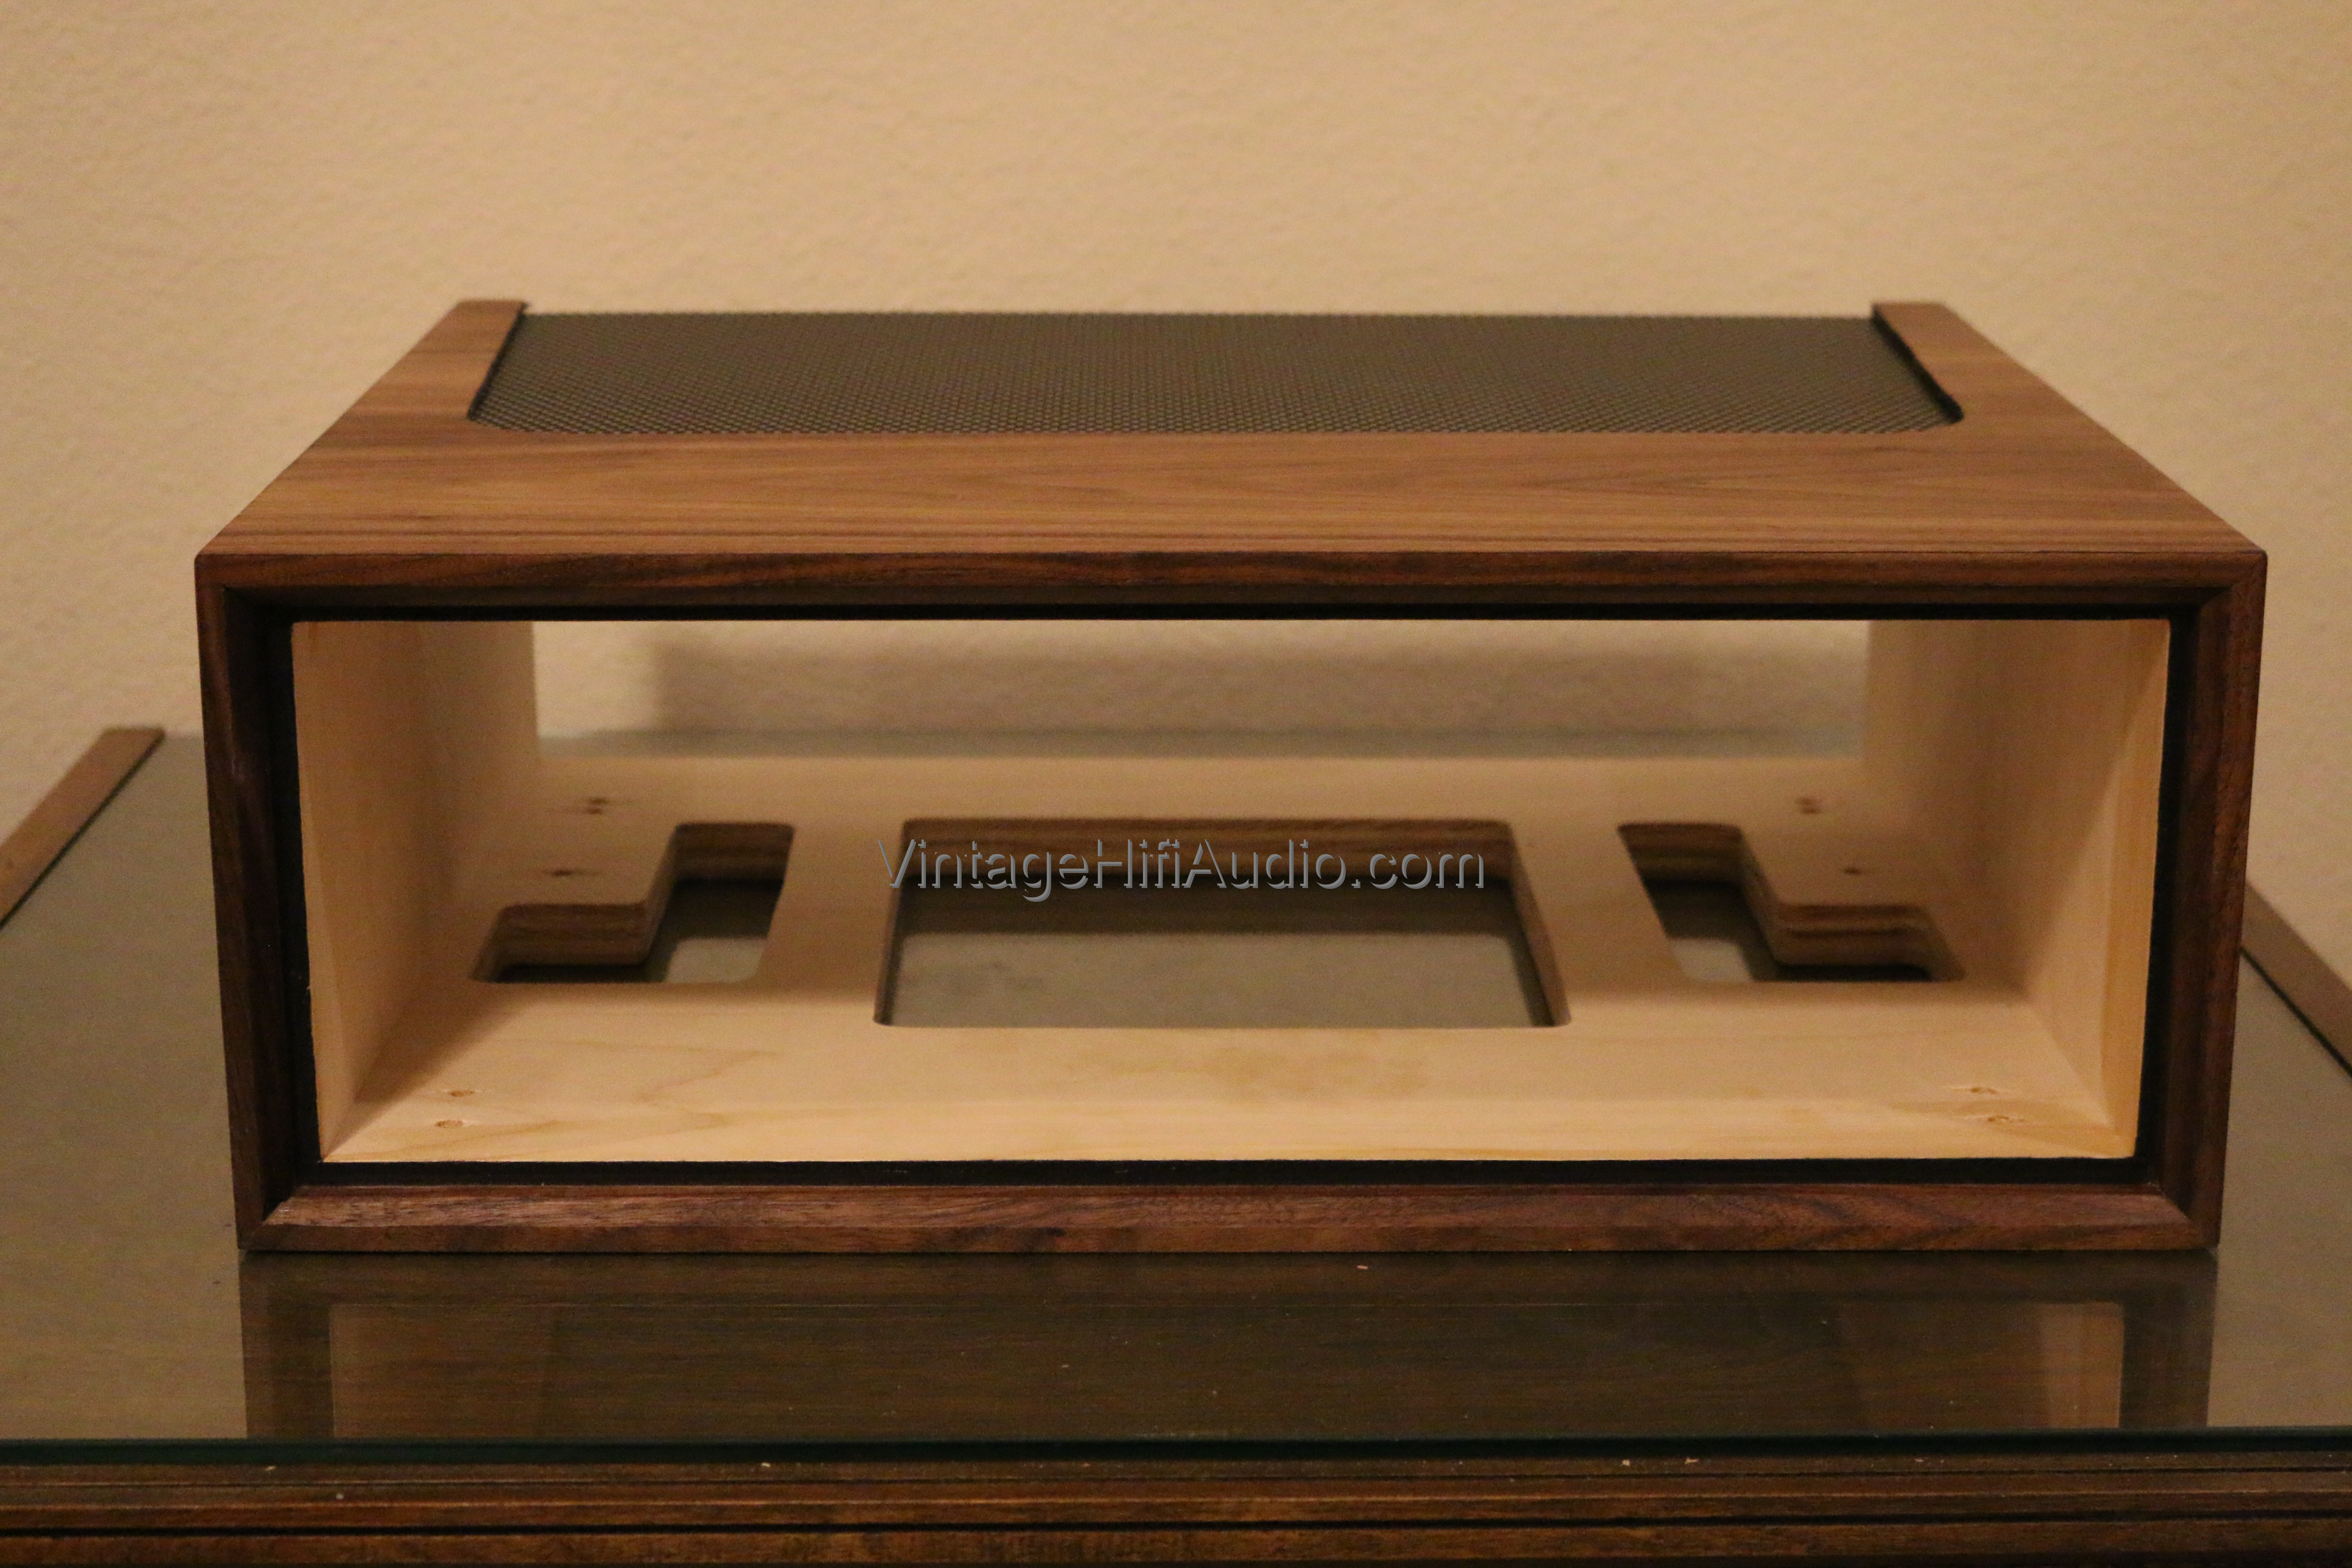 marantz wc 22 wc 42 wood case vintage hifi audio. Black Bedroom Furniture Sets. Home Design Ideas